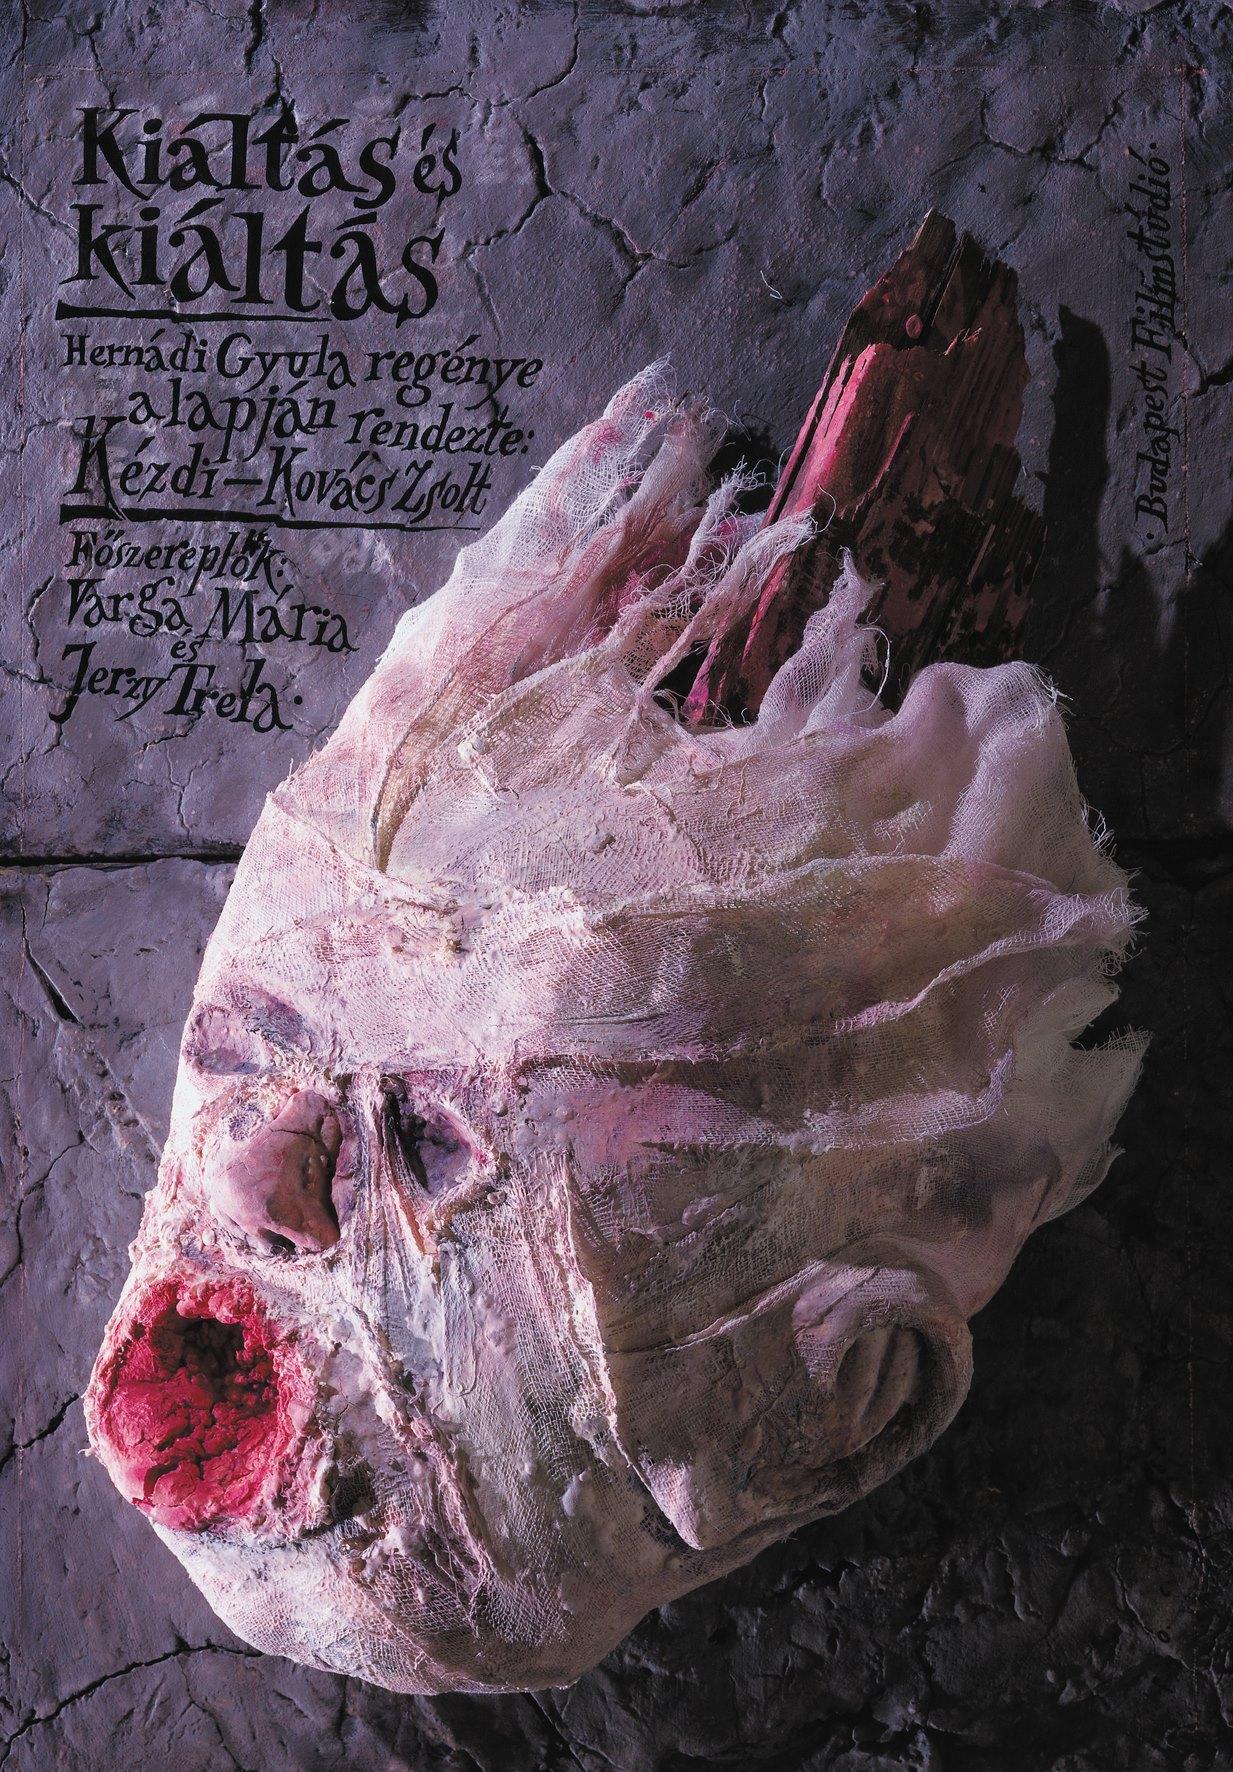 Péter Pócs - Zsolt Kézdi-Kovács- HUE AND CRY film poster, 1988